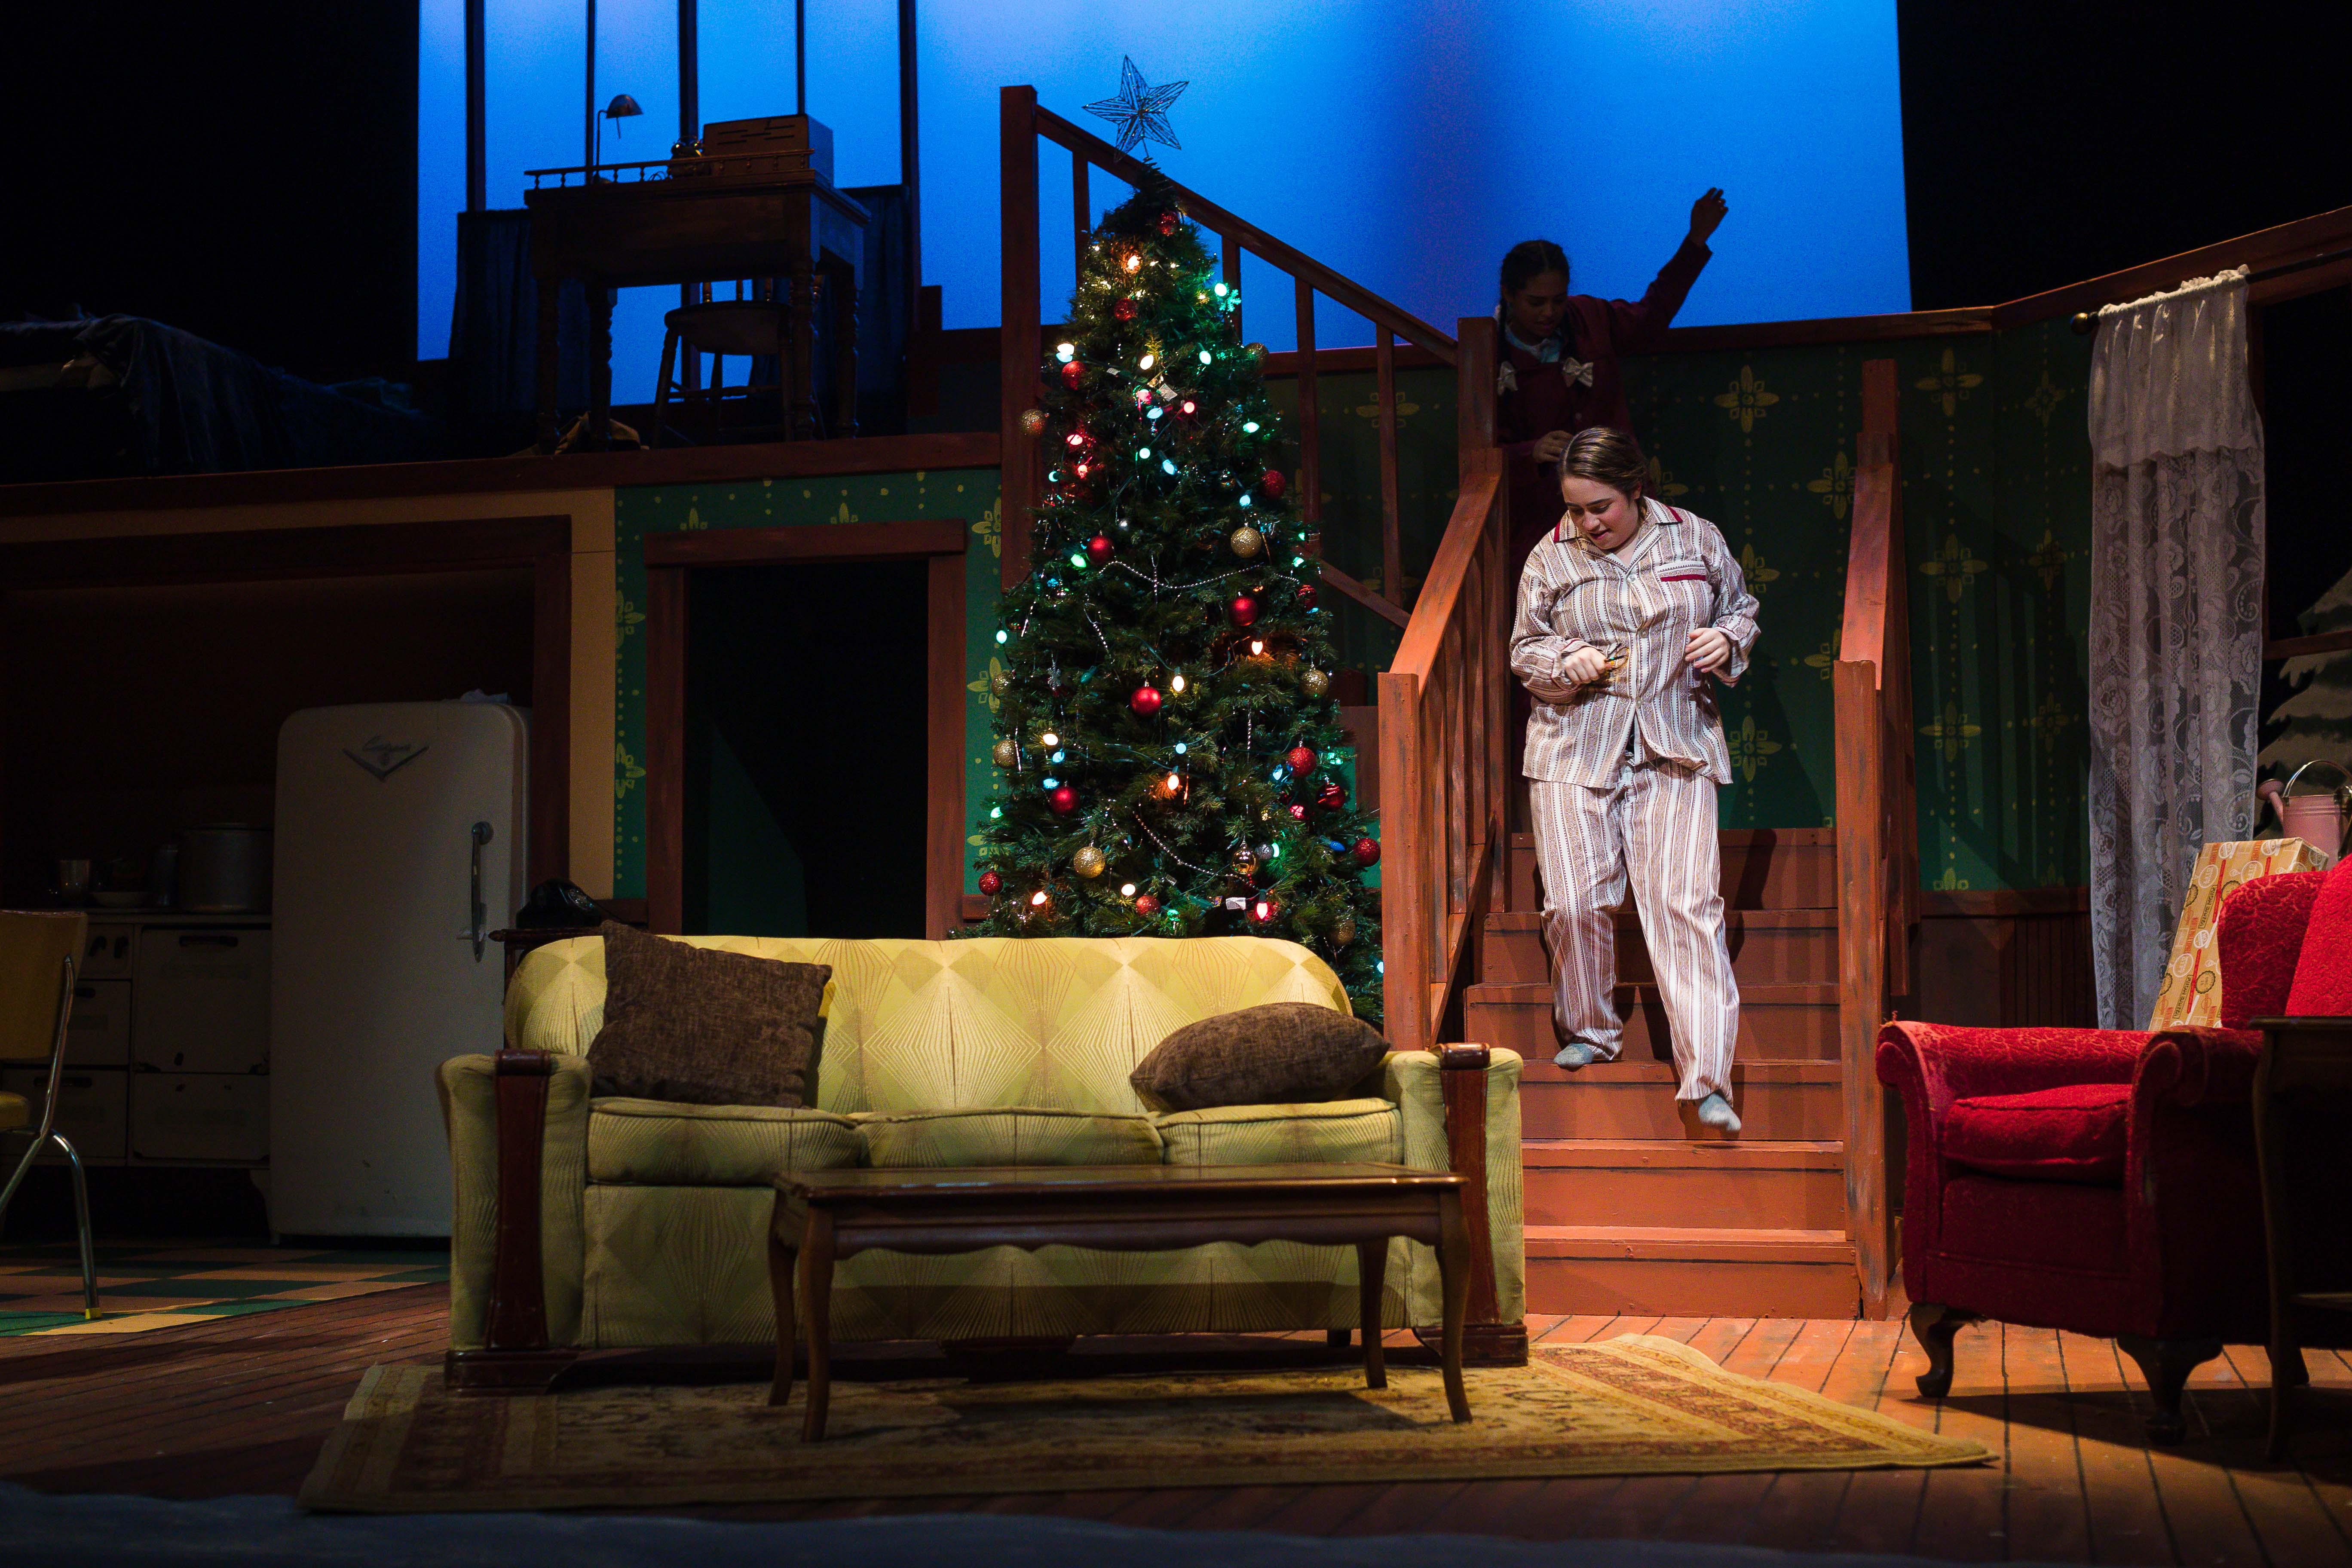 Weaver_Christmasshoot-_MG_1498